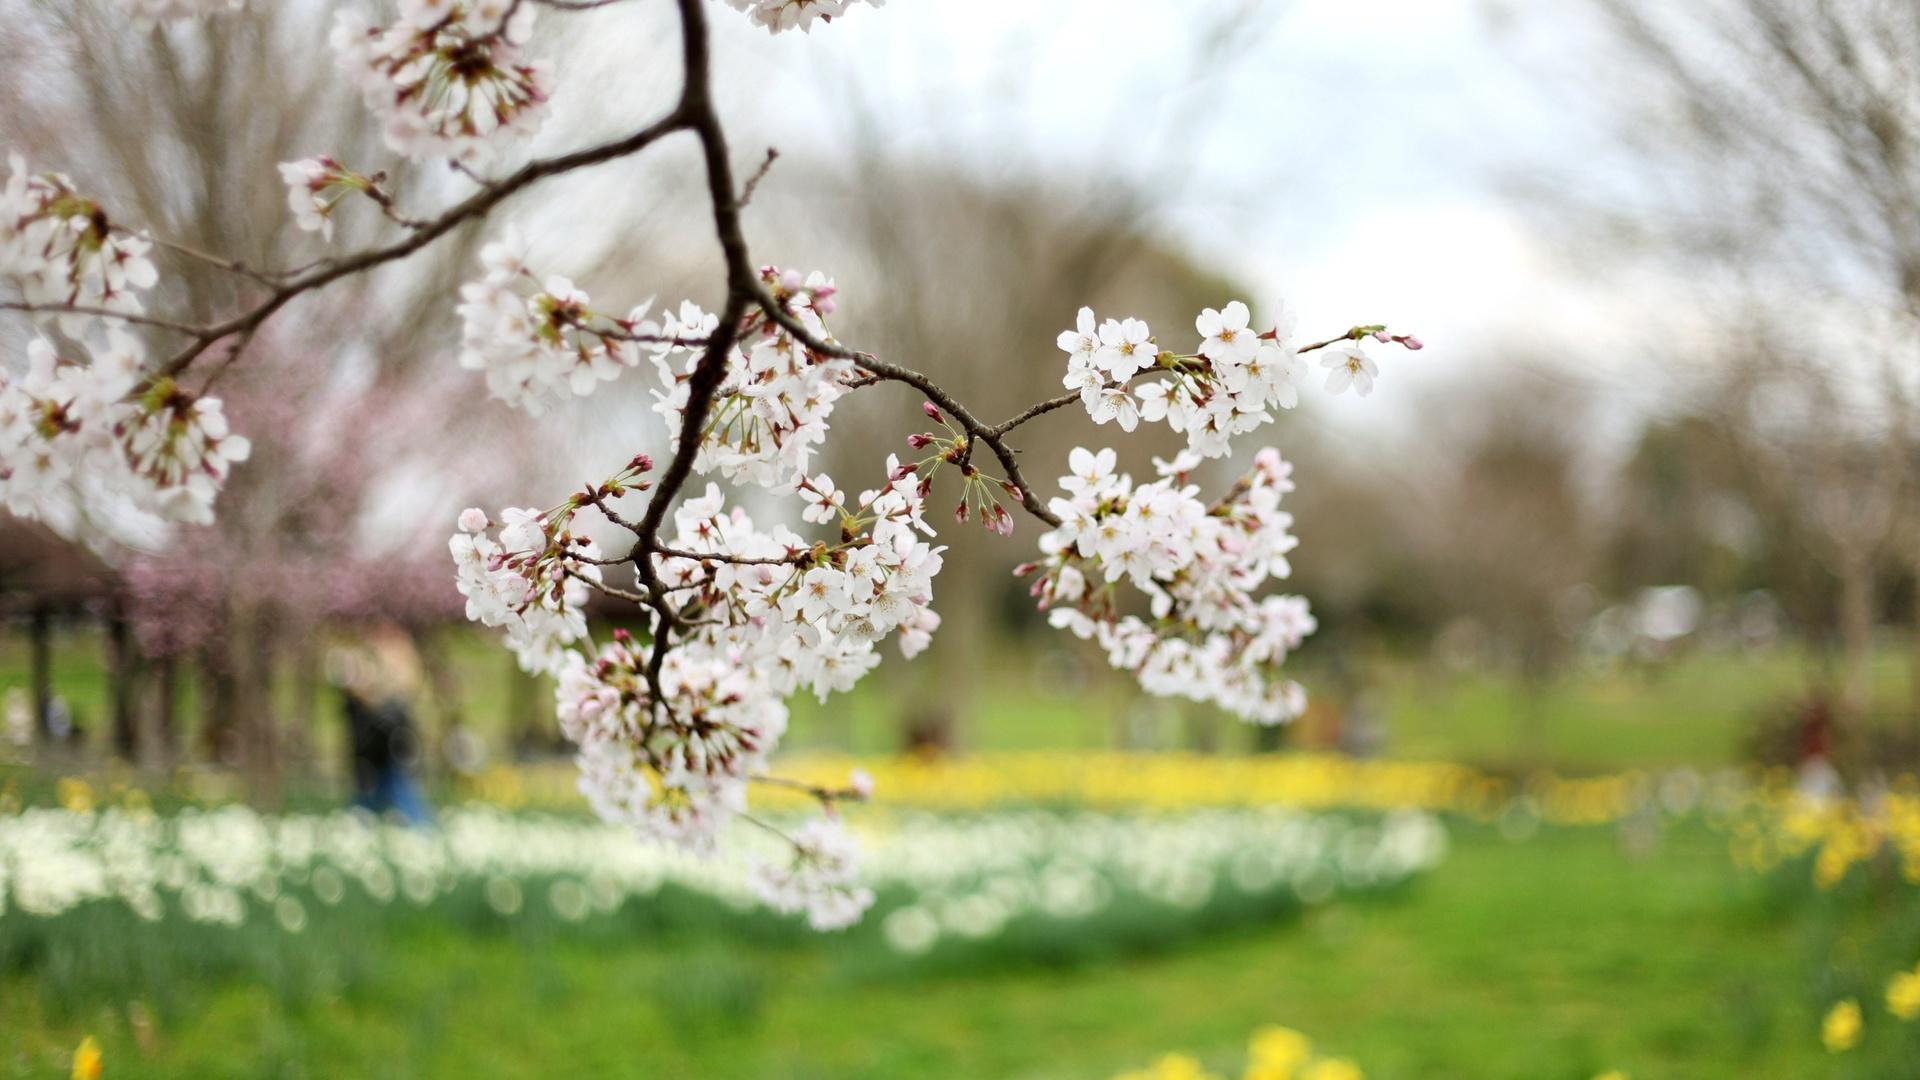 Springtime 1080p Wallpaper